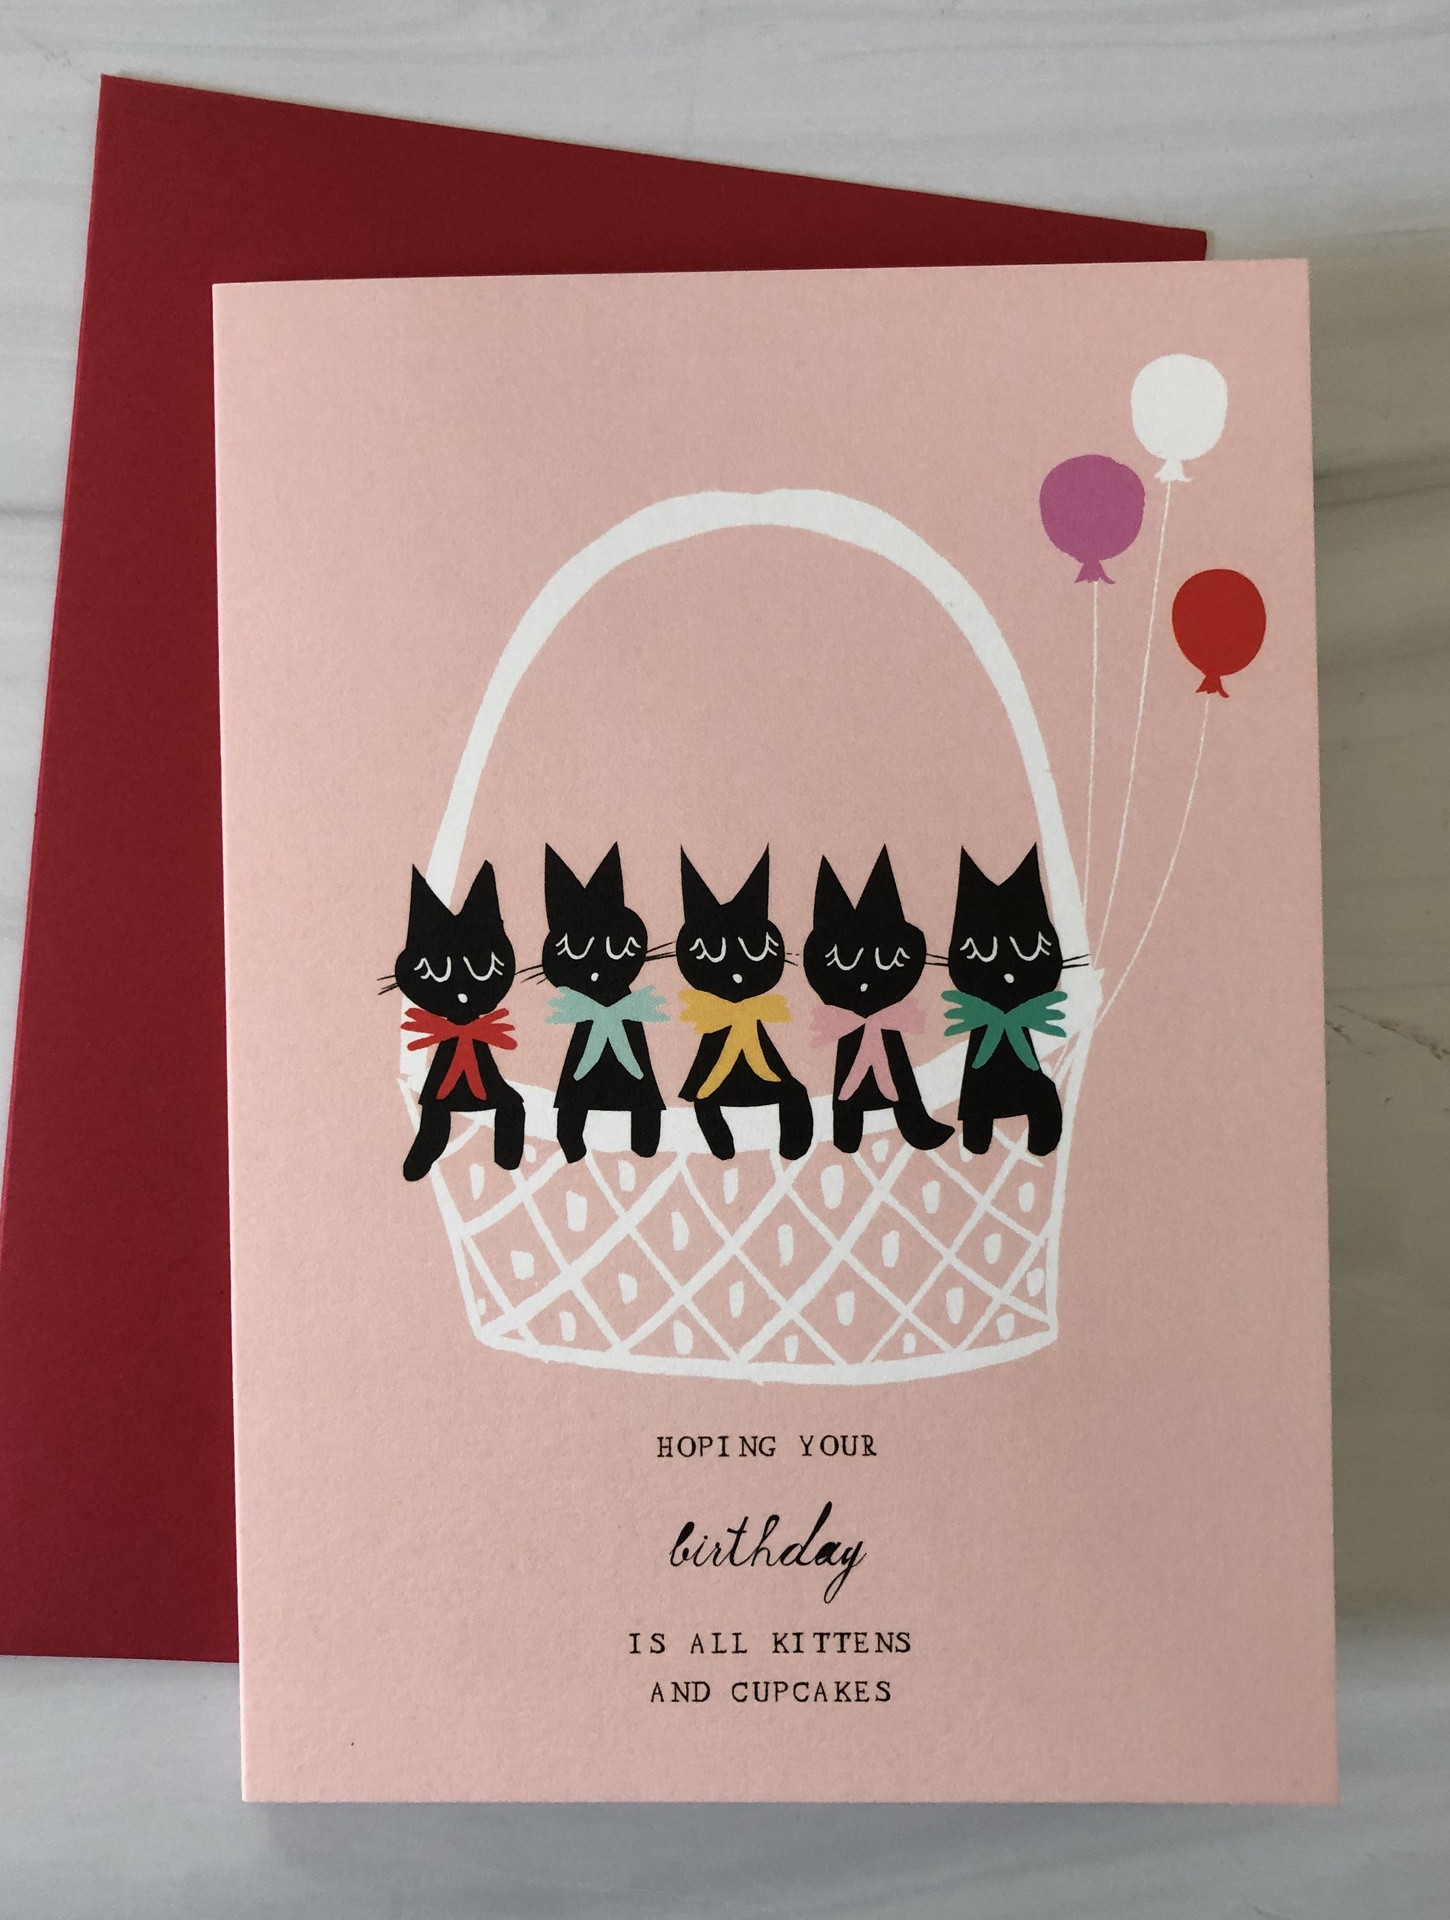 Kittens & Cupcake Birthday, Blank Greeting Card